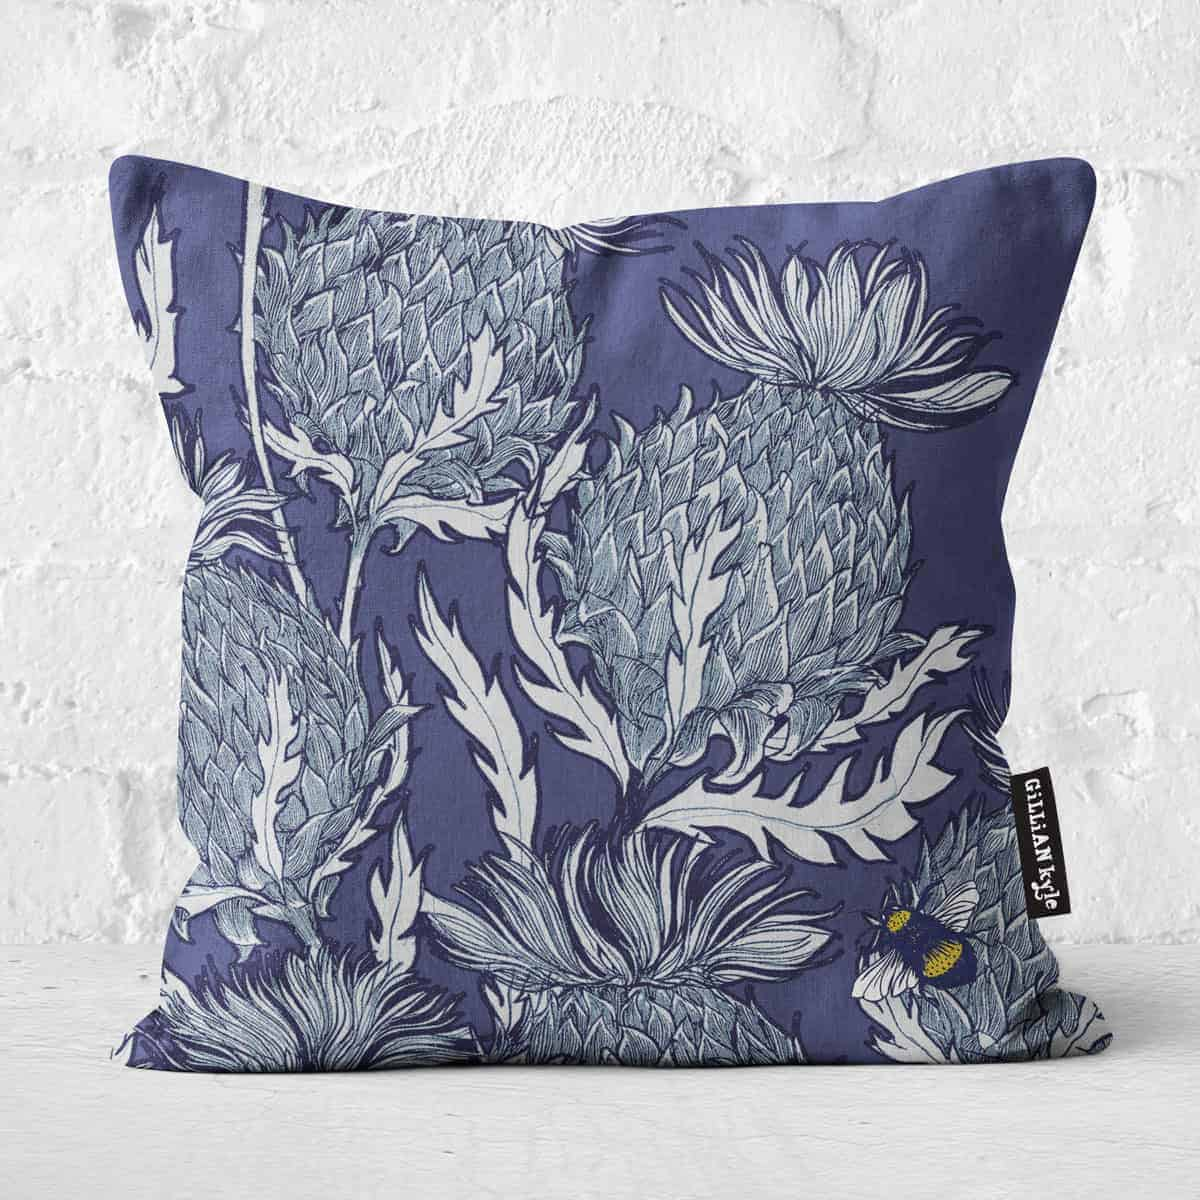 Flower of Scotland, Scottish Thistle cushion design by Scottish artist Gillian Kyle